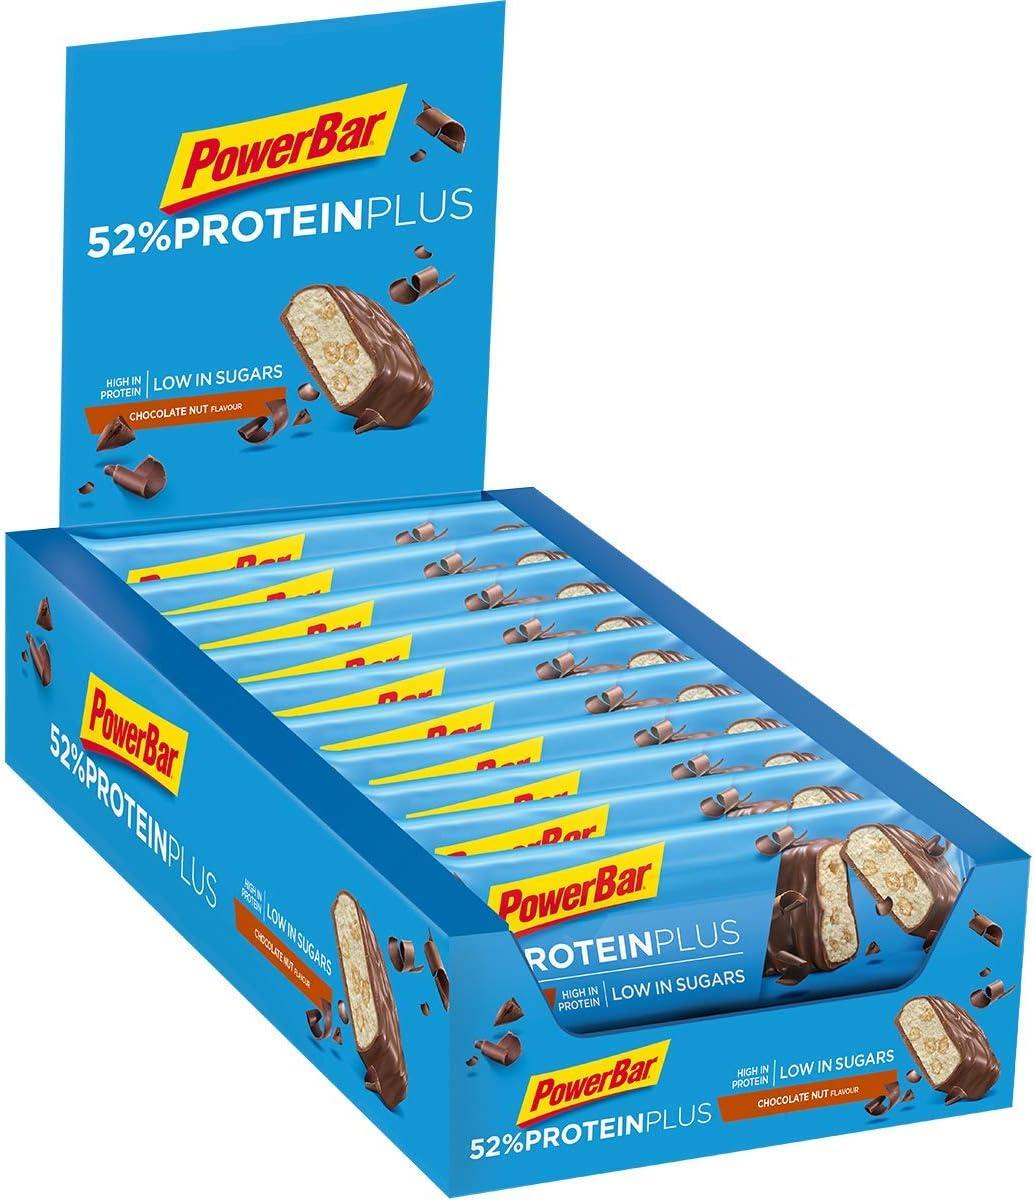 PowerBar Protein Plus 52% Chocolate Nut 20x50g - Barras de Proteína con Bajo Contenido de Azúcar